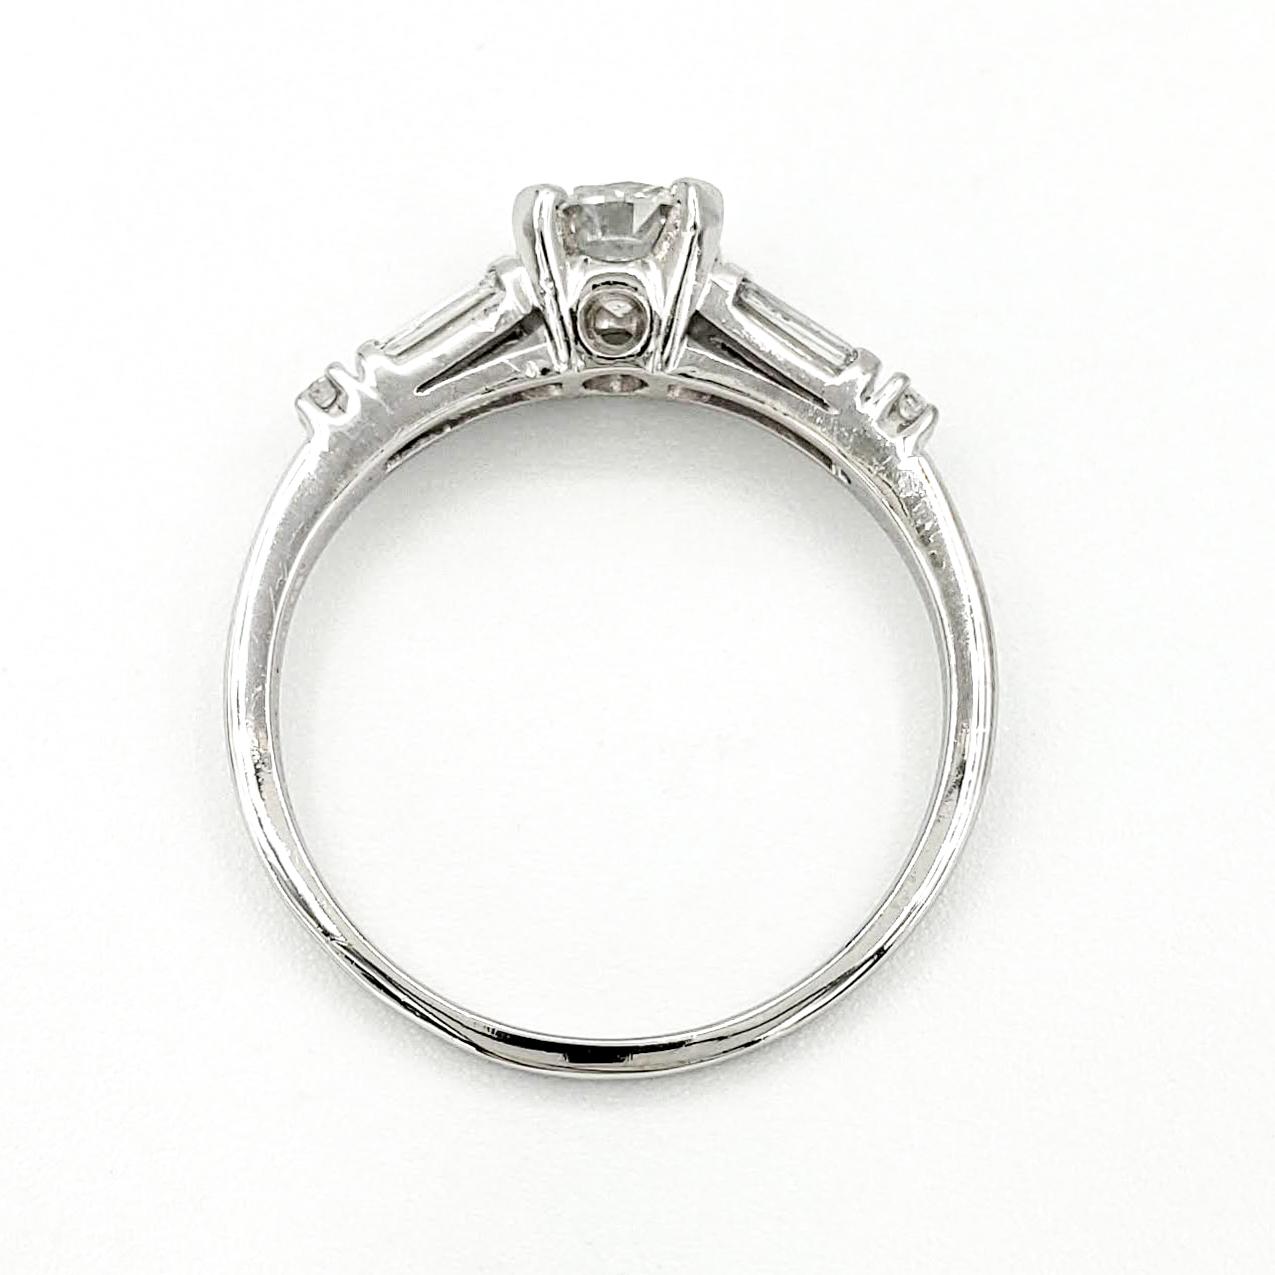 vintage-platinum-engagement-ring-with-0-56-carat-round-brilliant-cut-diamond-egl-e-vs1